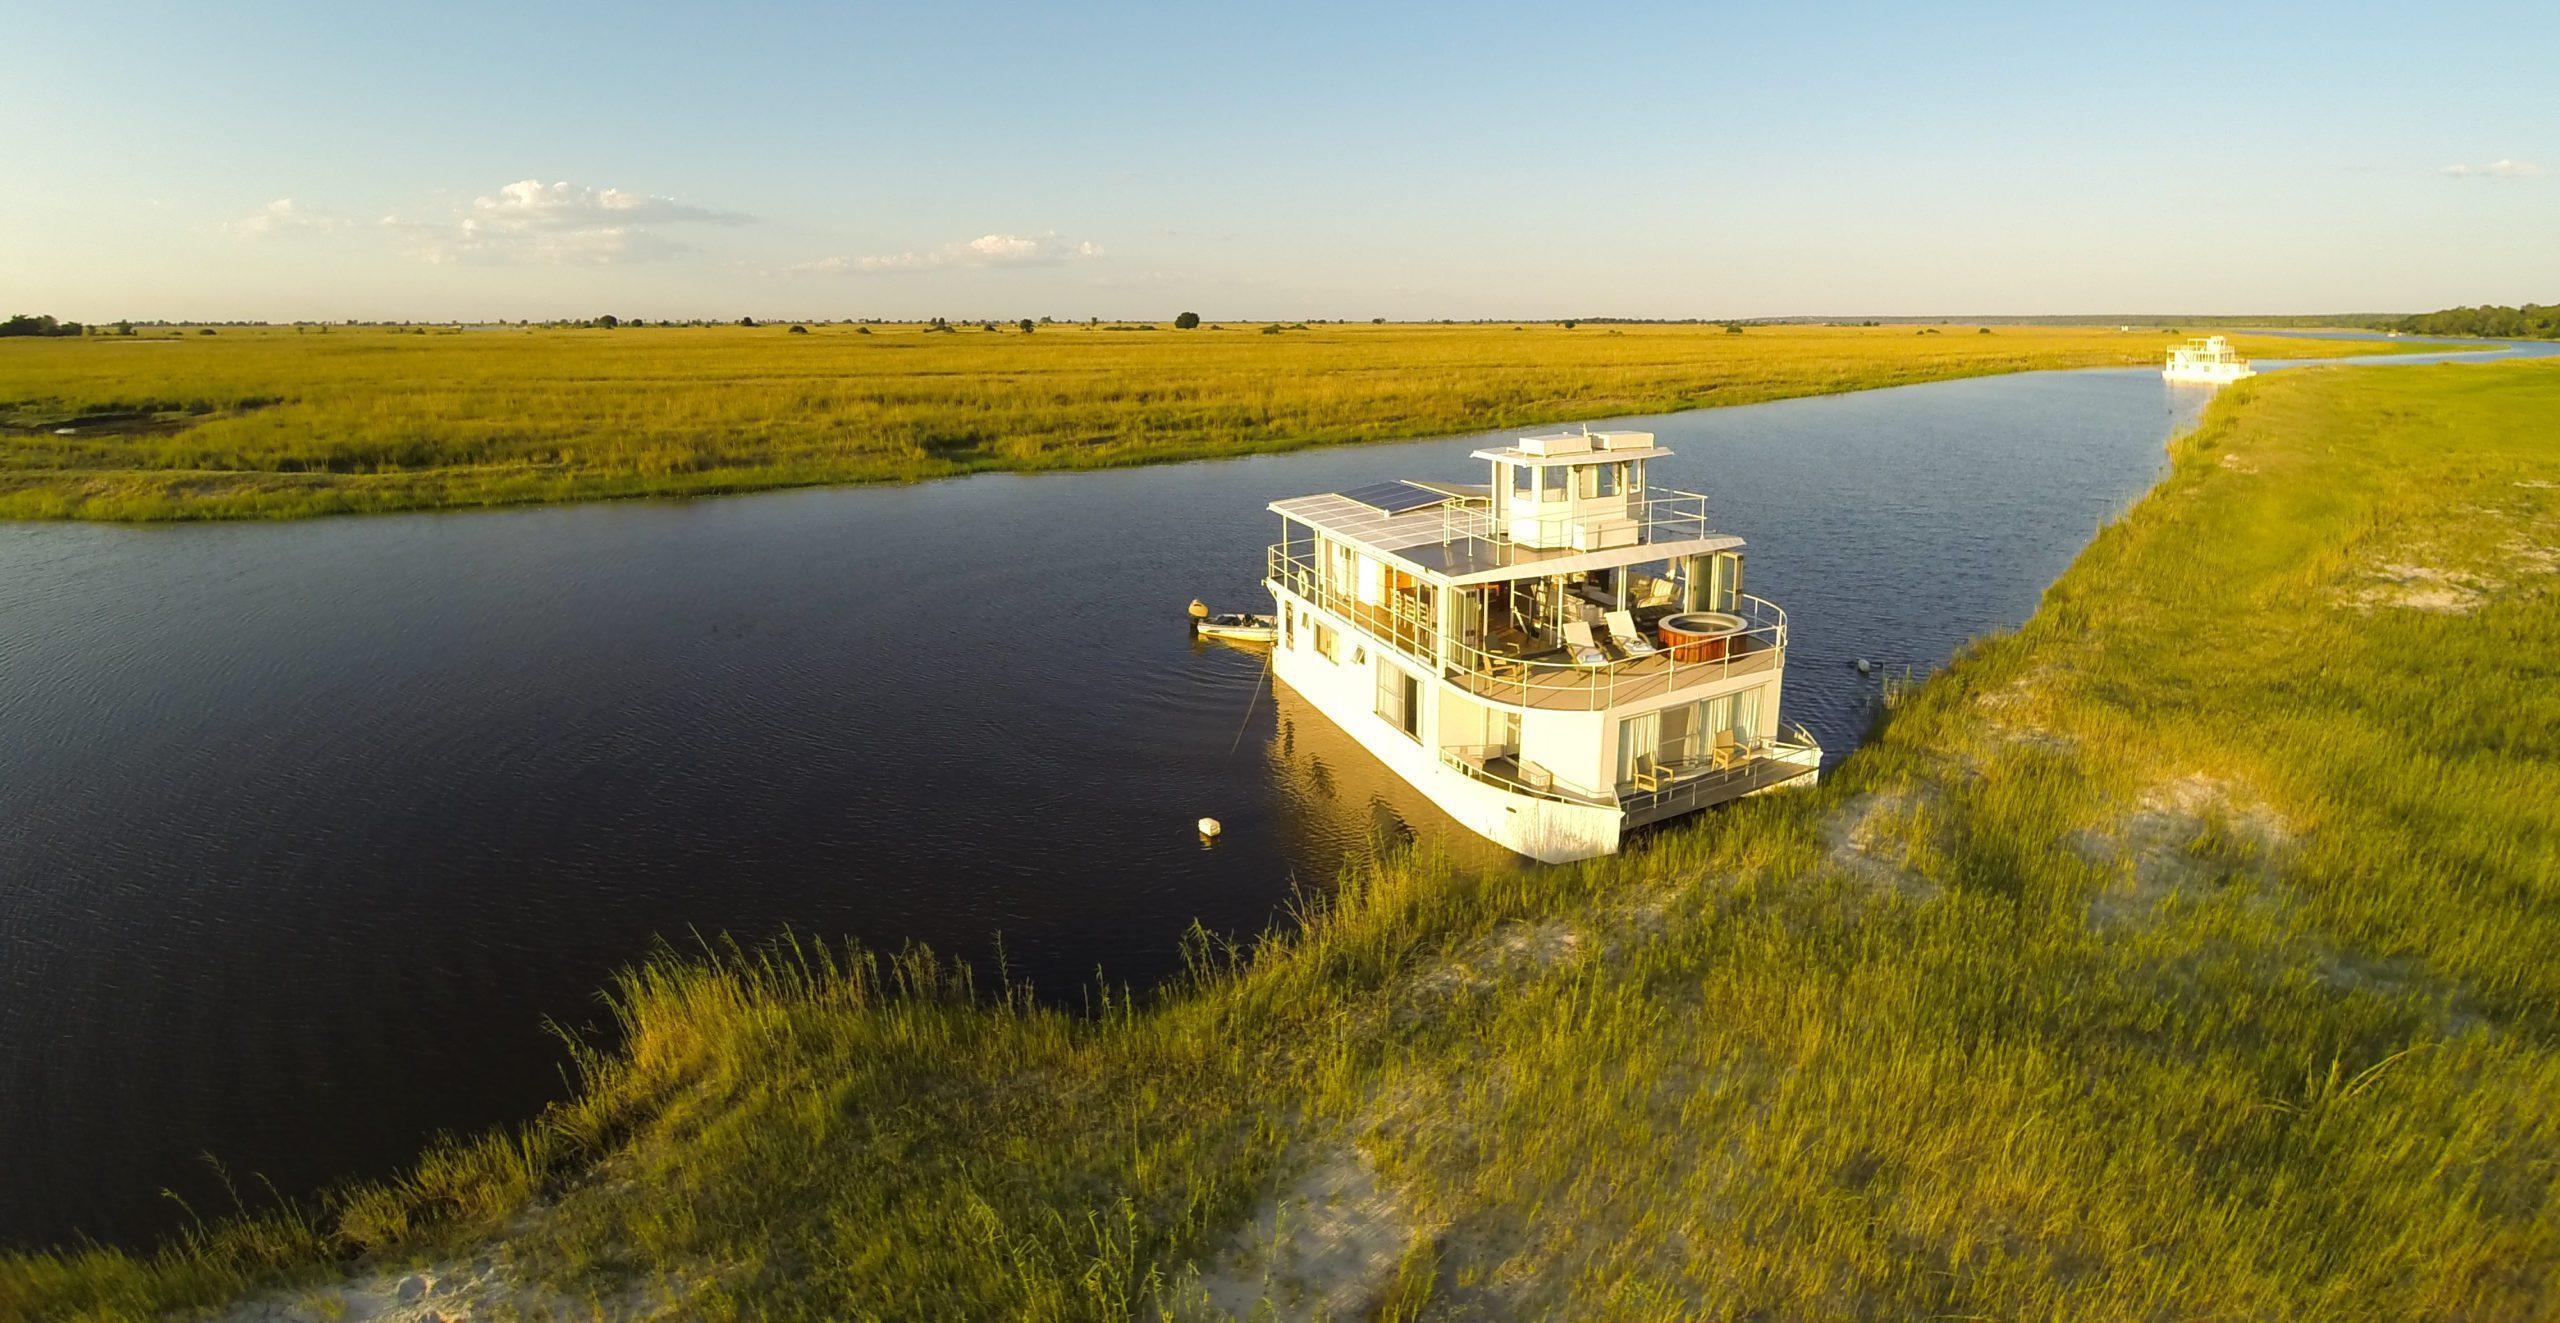 Chobe Princess river cruise stopped along the grassy banks